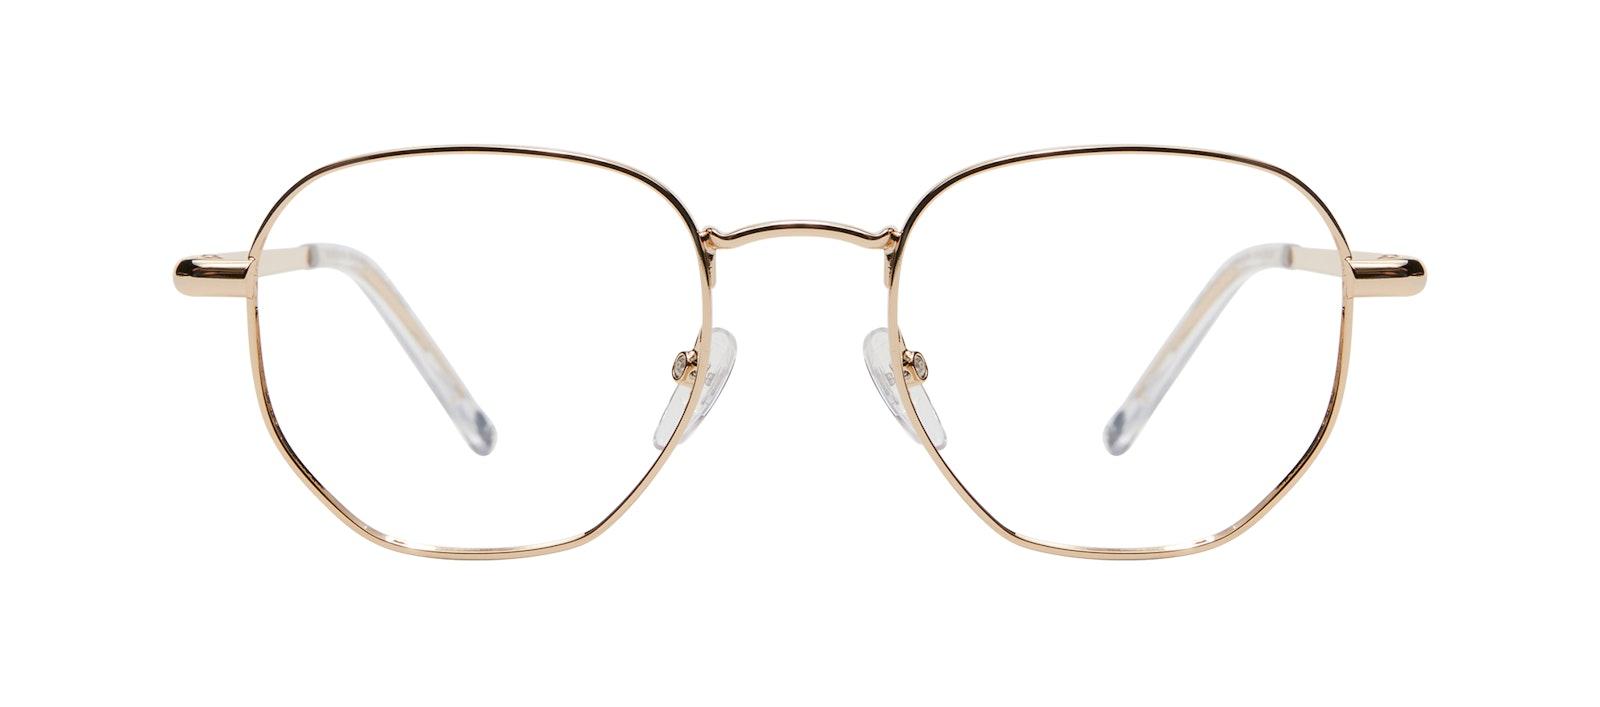 Affordable Fashion Glasses Round Eyeglasses Men Women Aura Gold Front